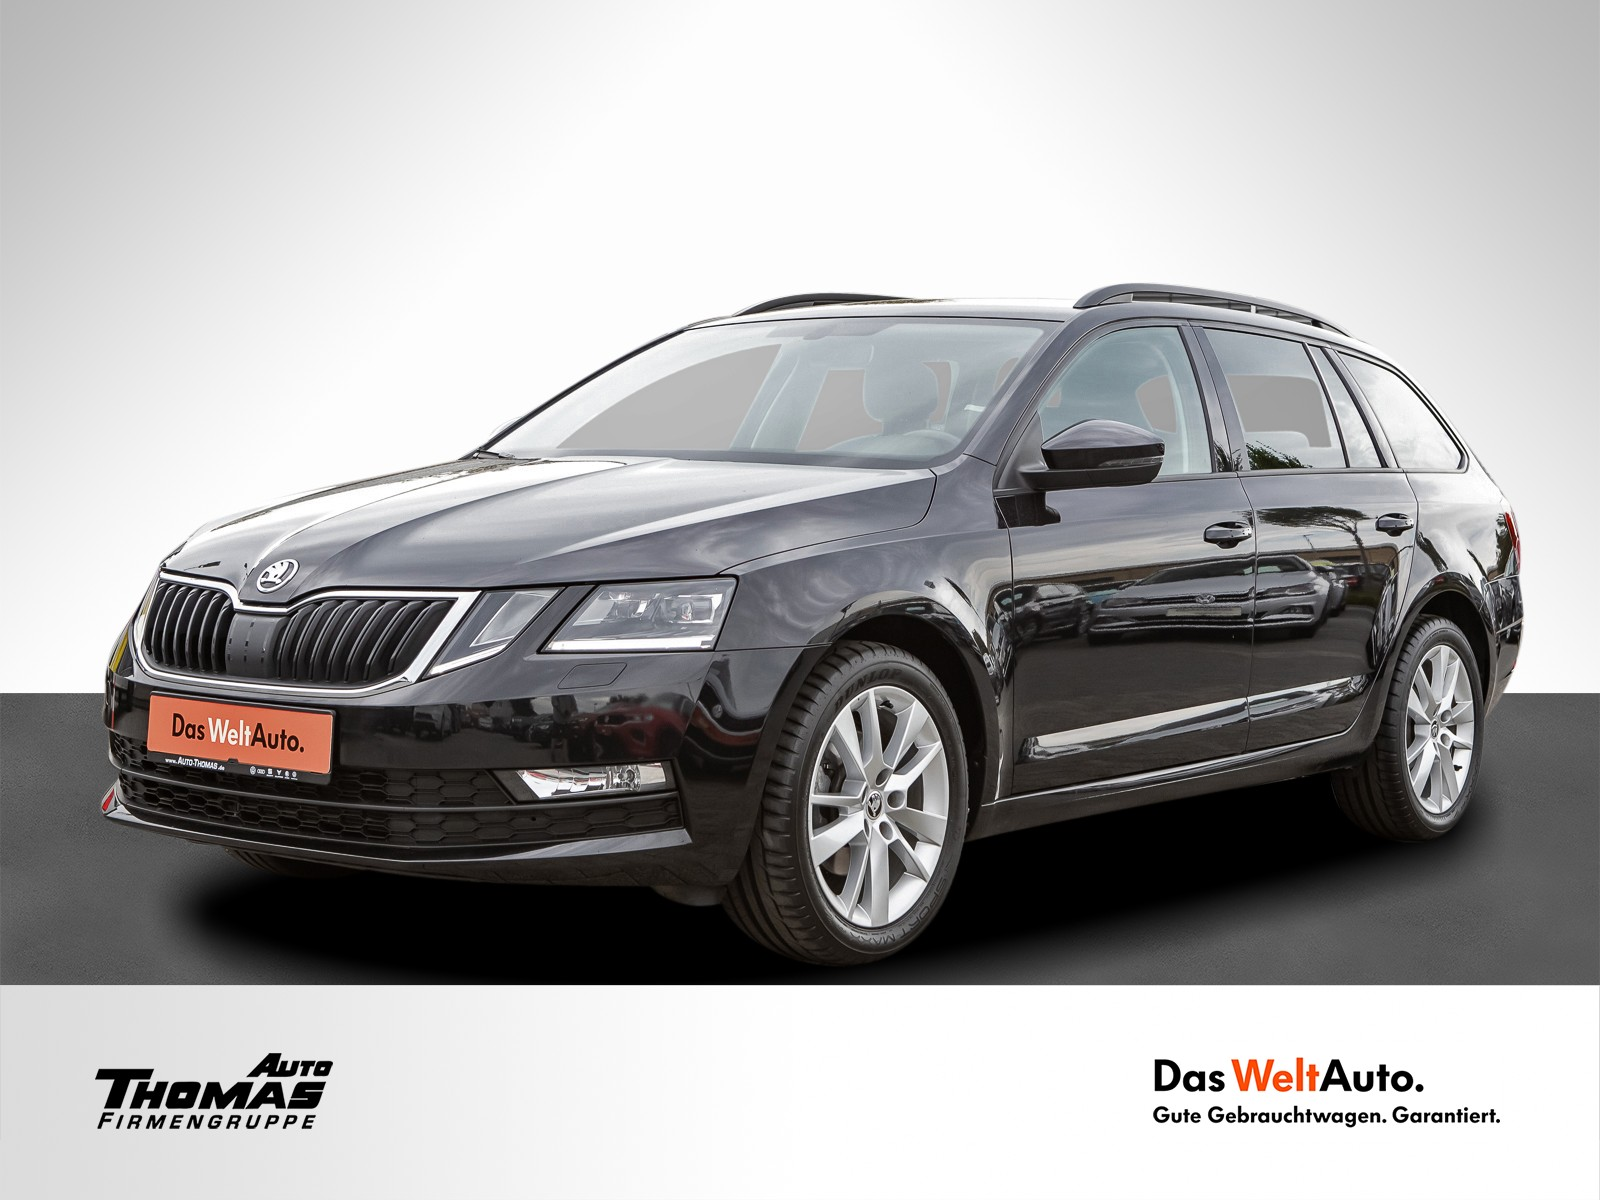 Skoda Octavia Combi 1.4 TSI Ambition, 110 kW, Jahr 2017, Benzin